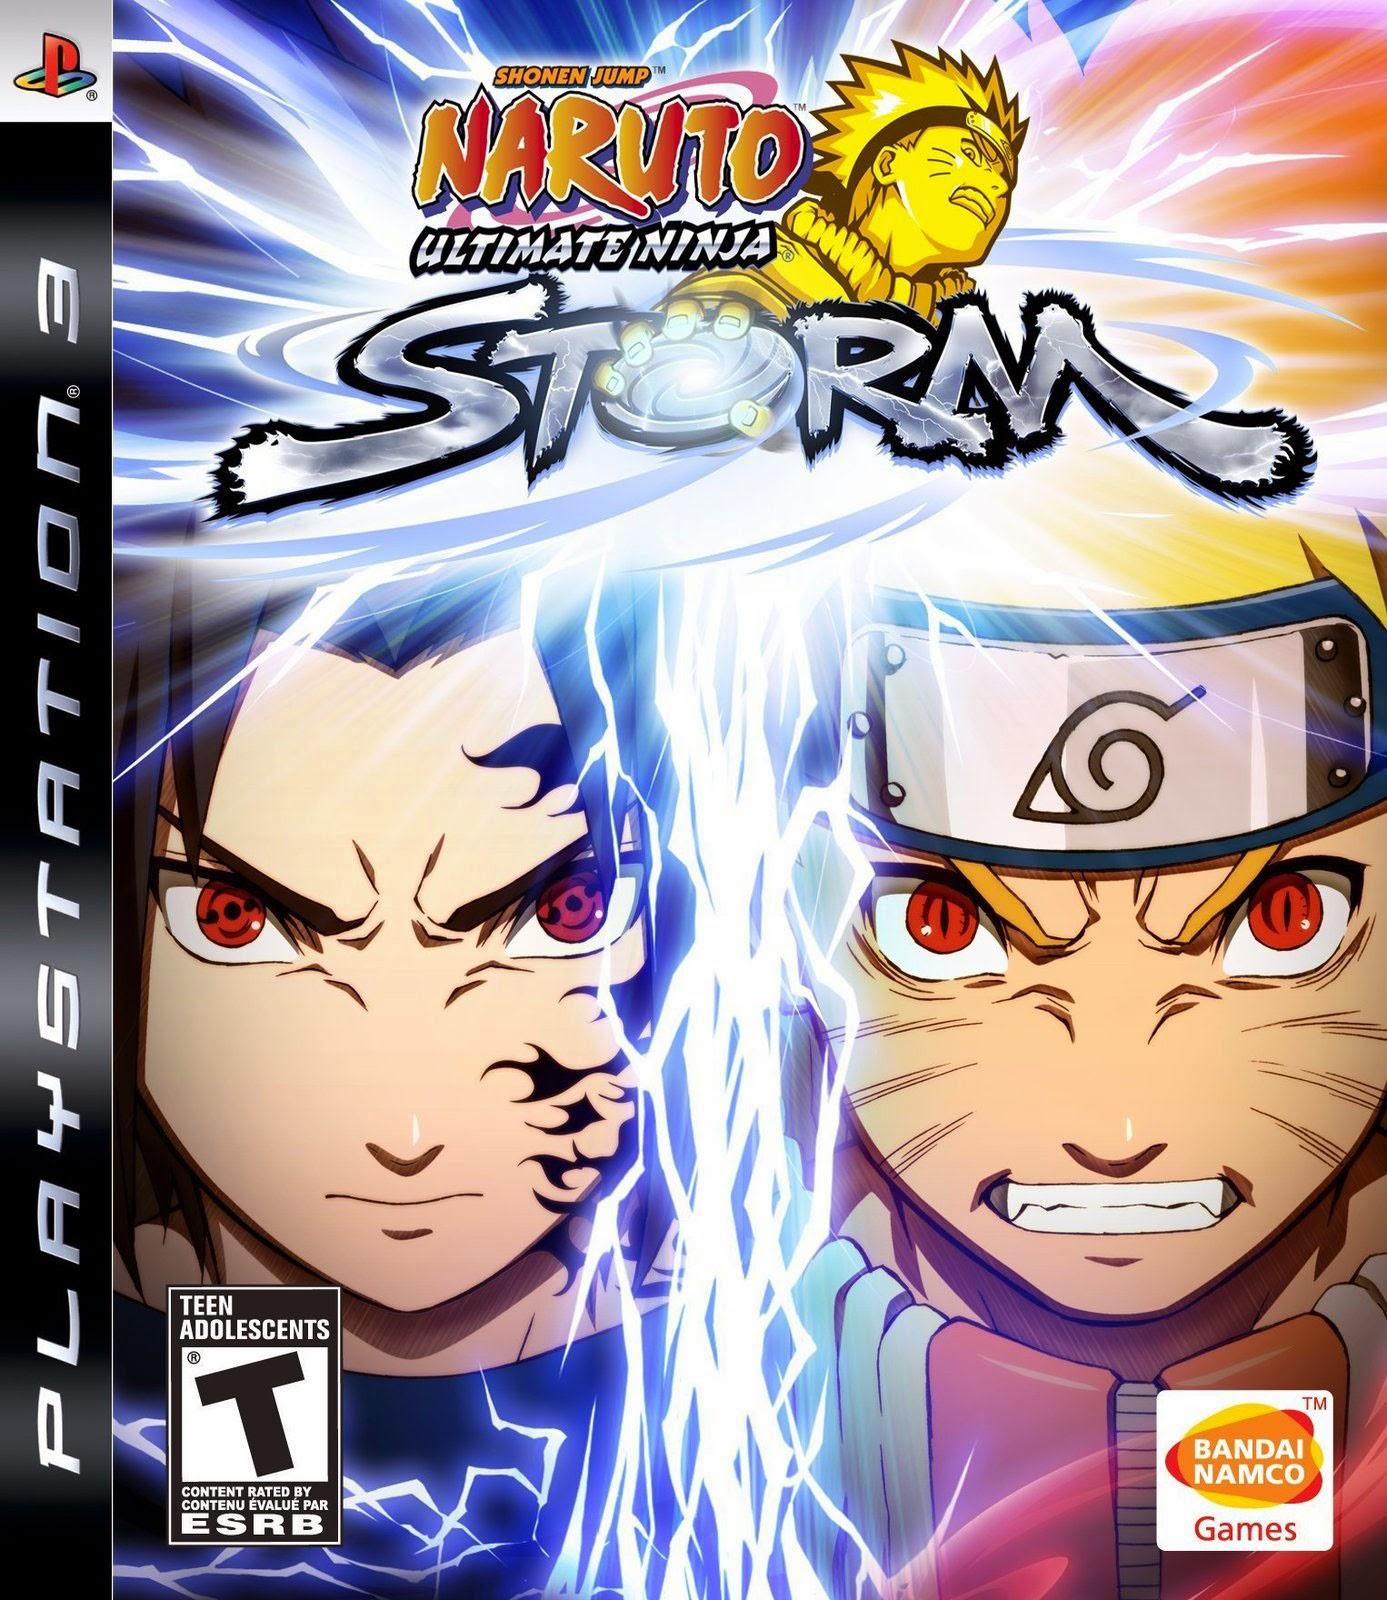 Naruto Ultimate Ninja Storm Playstation 3 Game